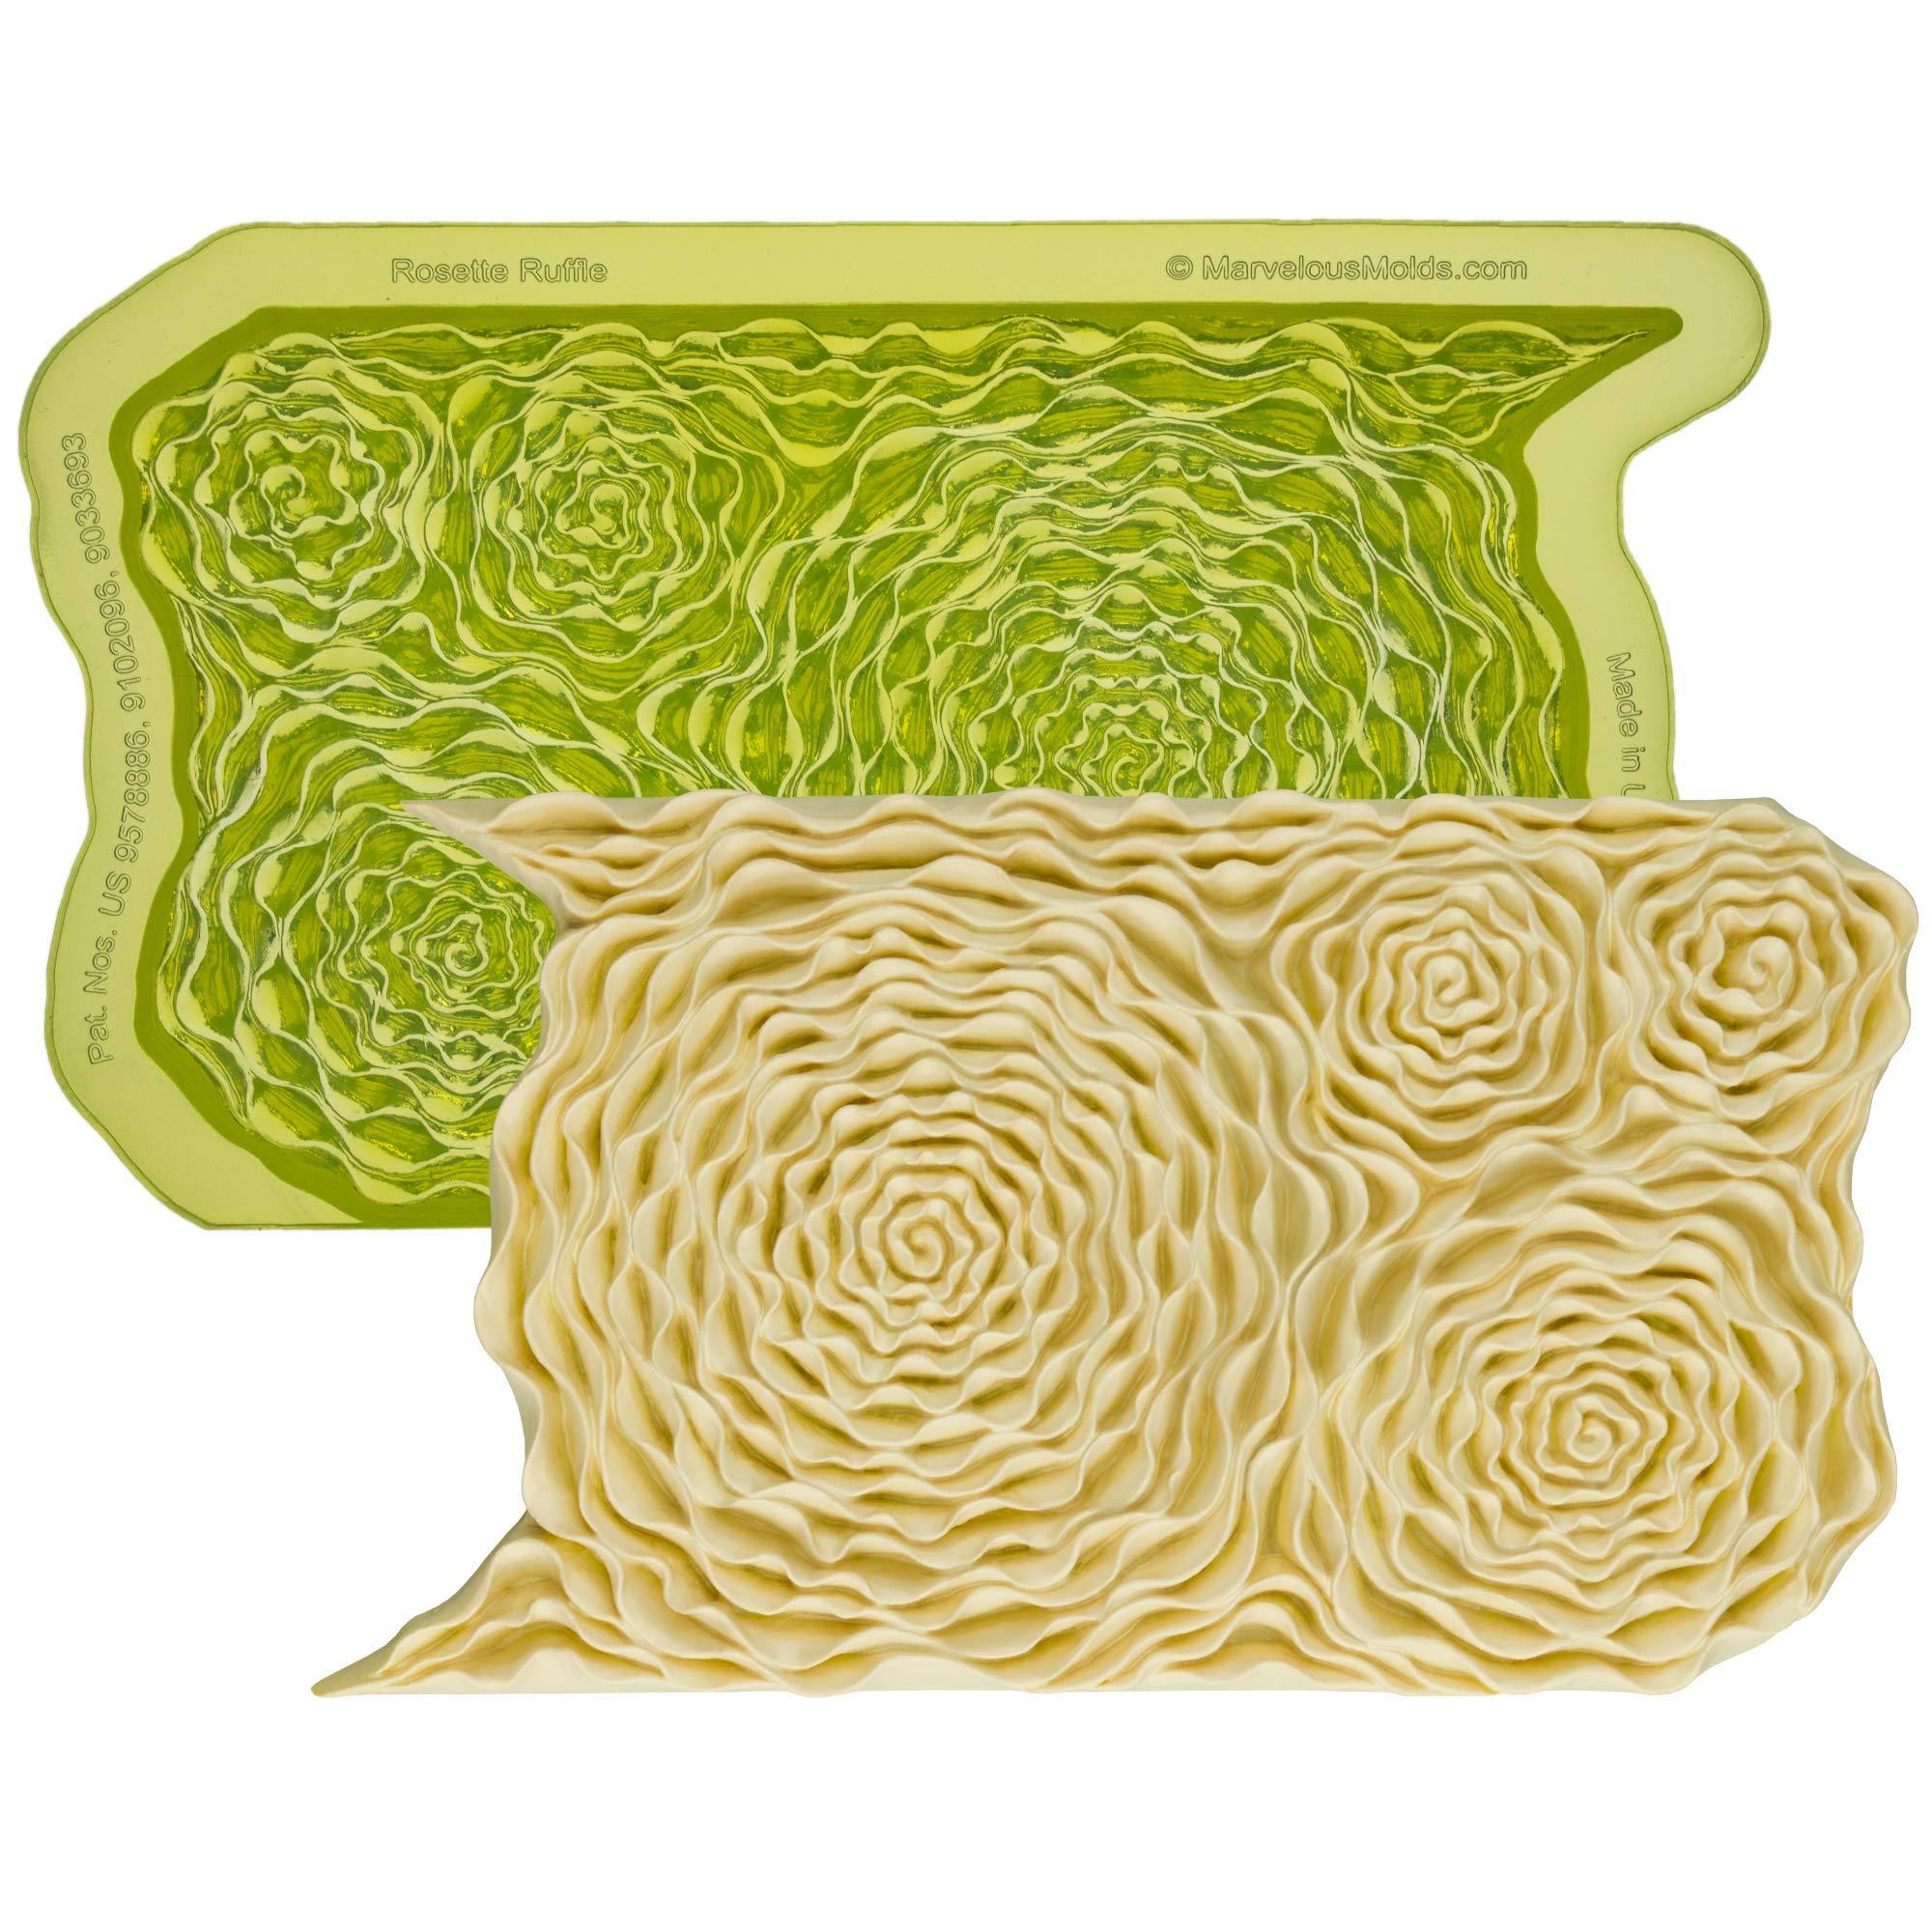 Marvelous Molds Rosette Ruffle Simpress Silicone Mold | Cake Decorating with Fondant, Gumpaste Icing